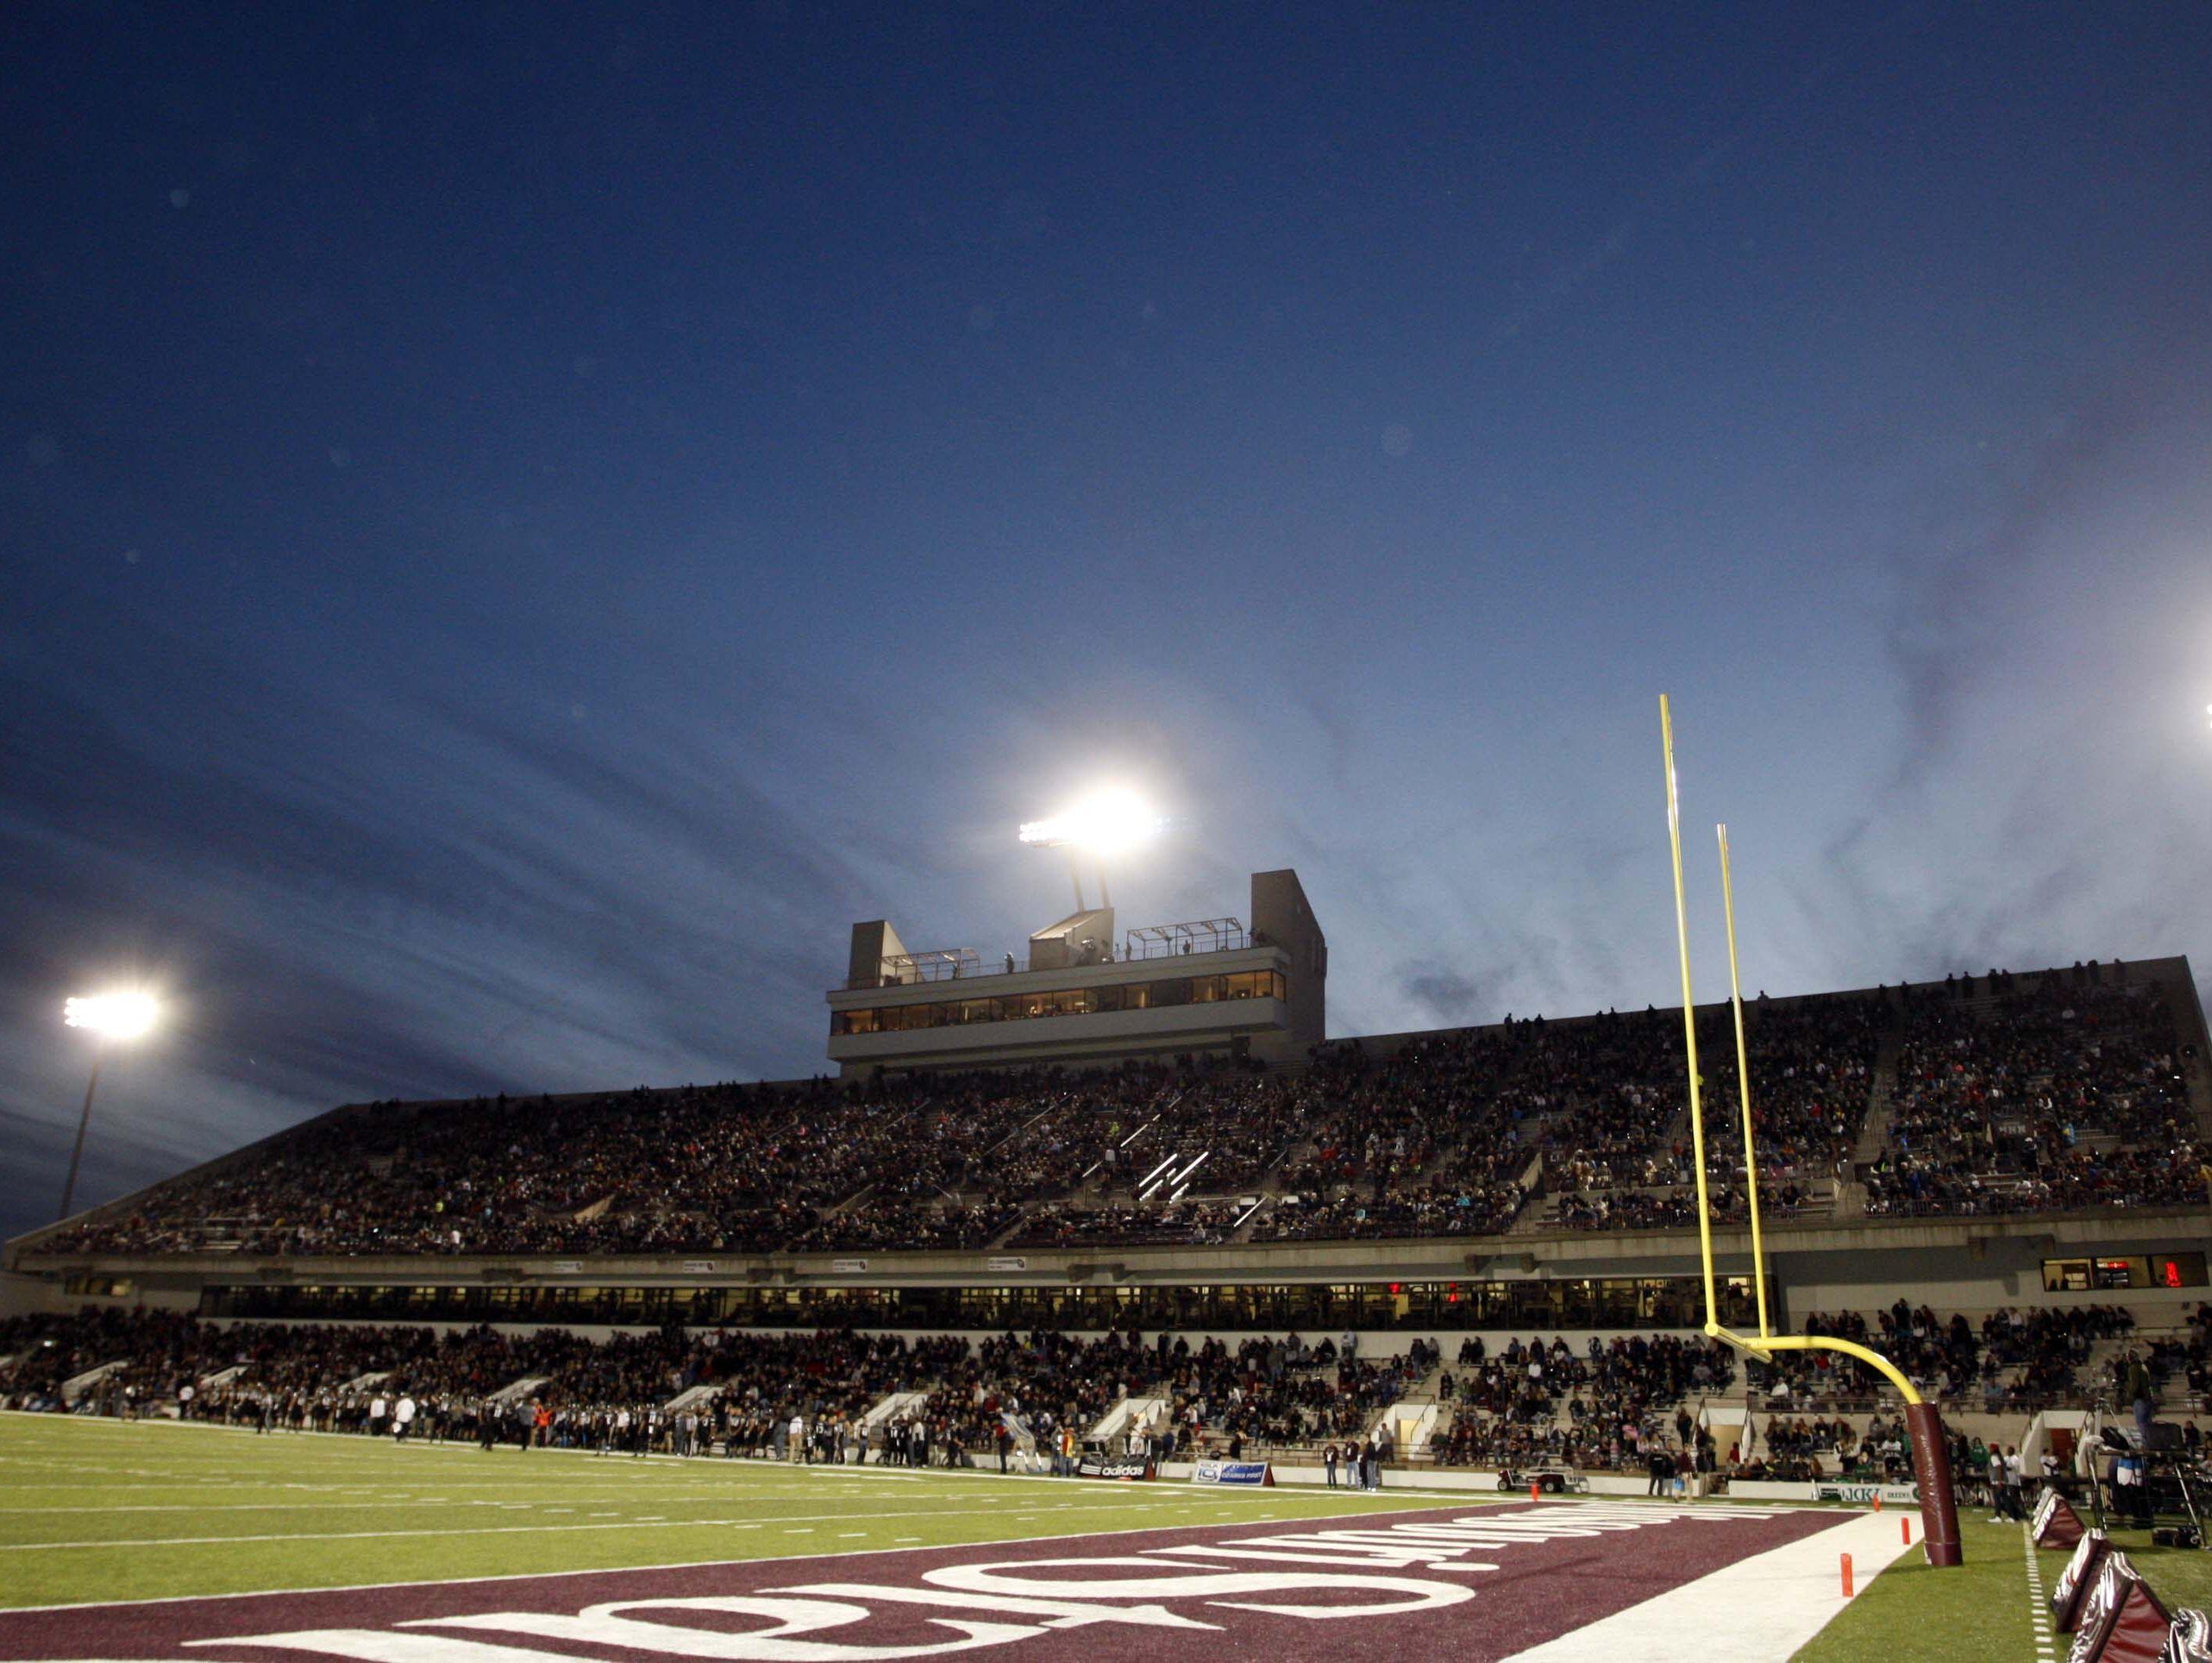 Missouri State University's Plaster Sports Complex hosts five Missouri state championship football games on Nov. 24 and 25.